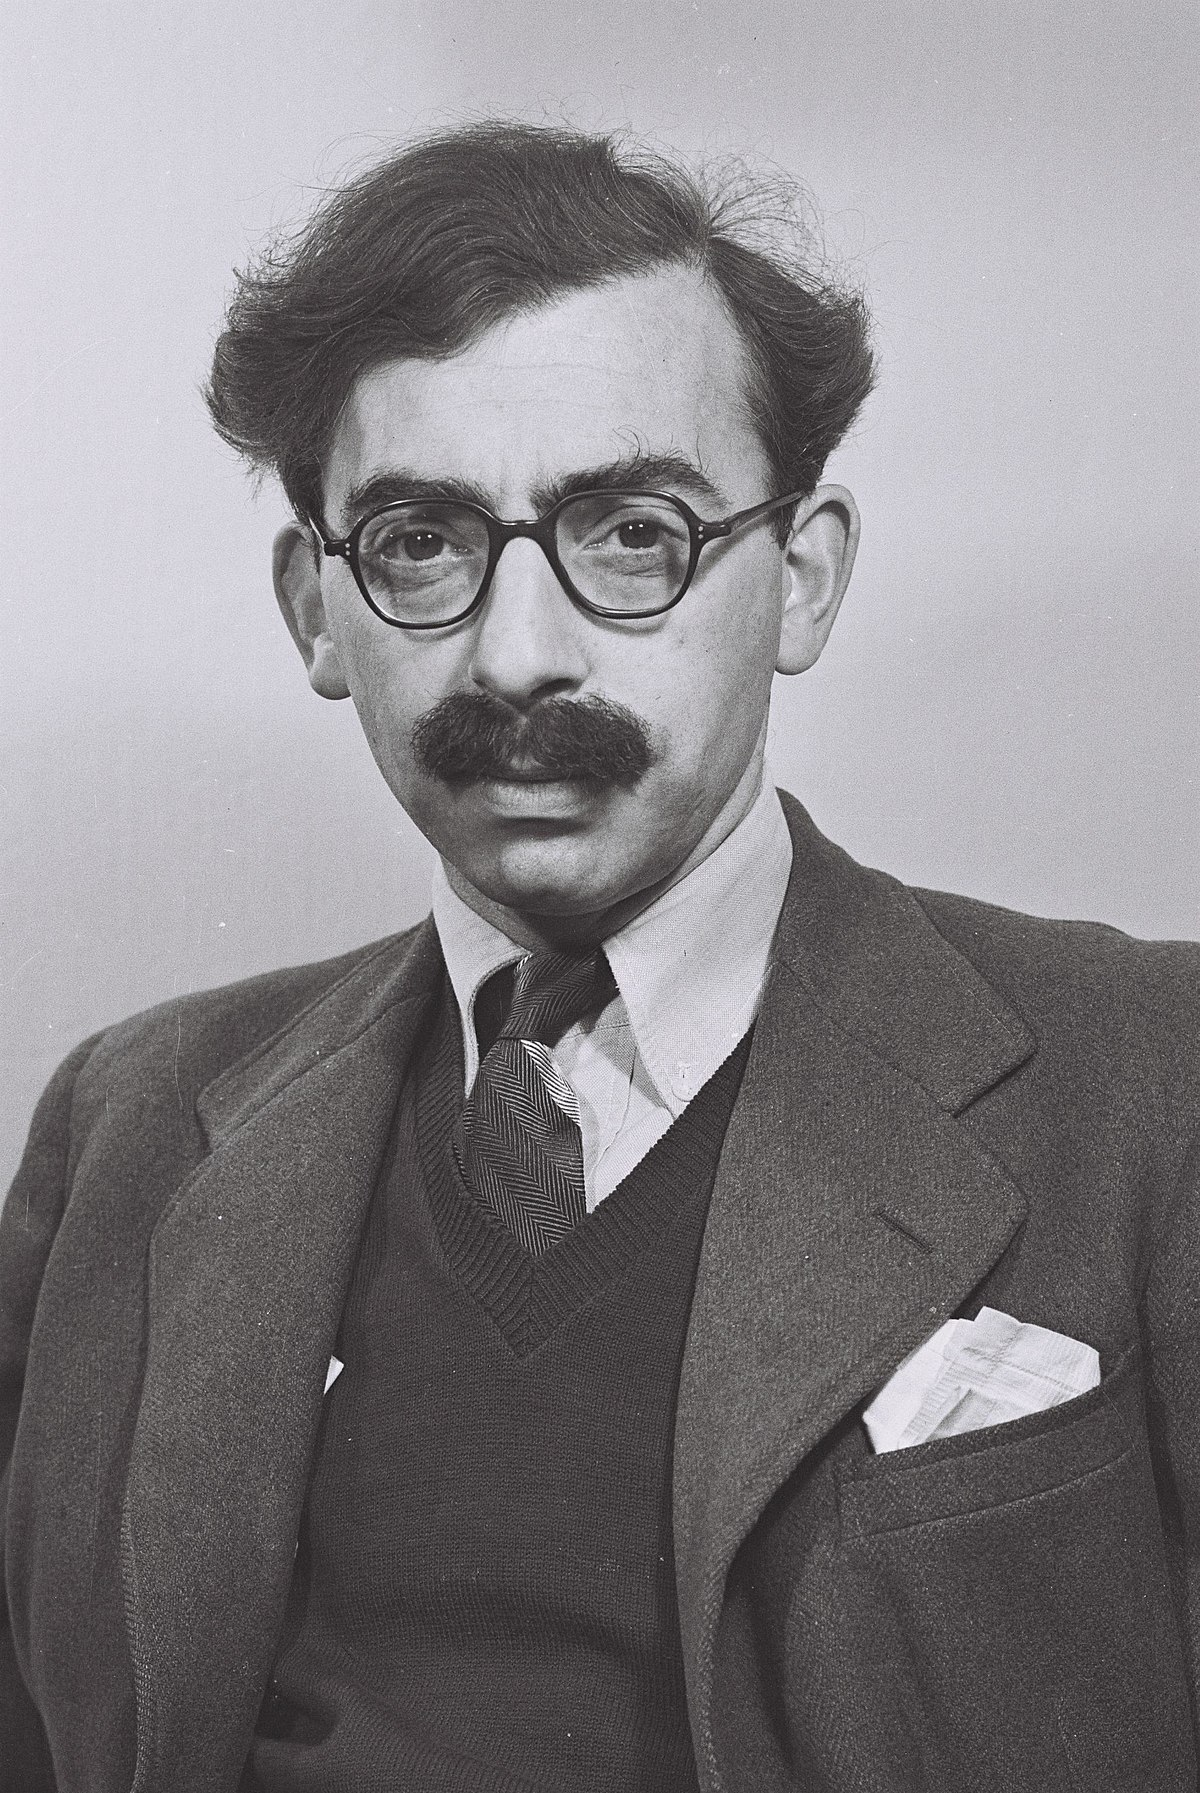 Moshe Pearlman